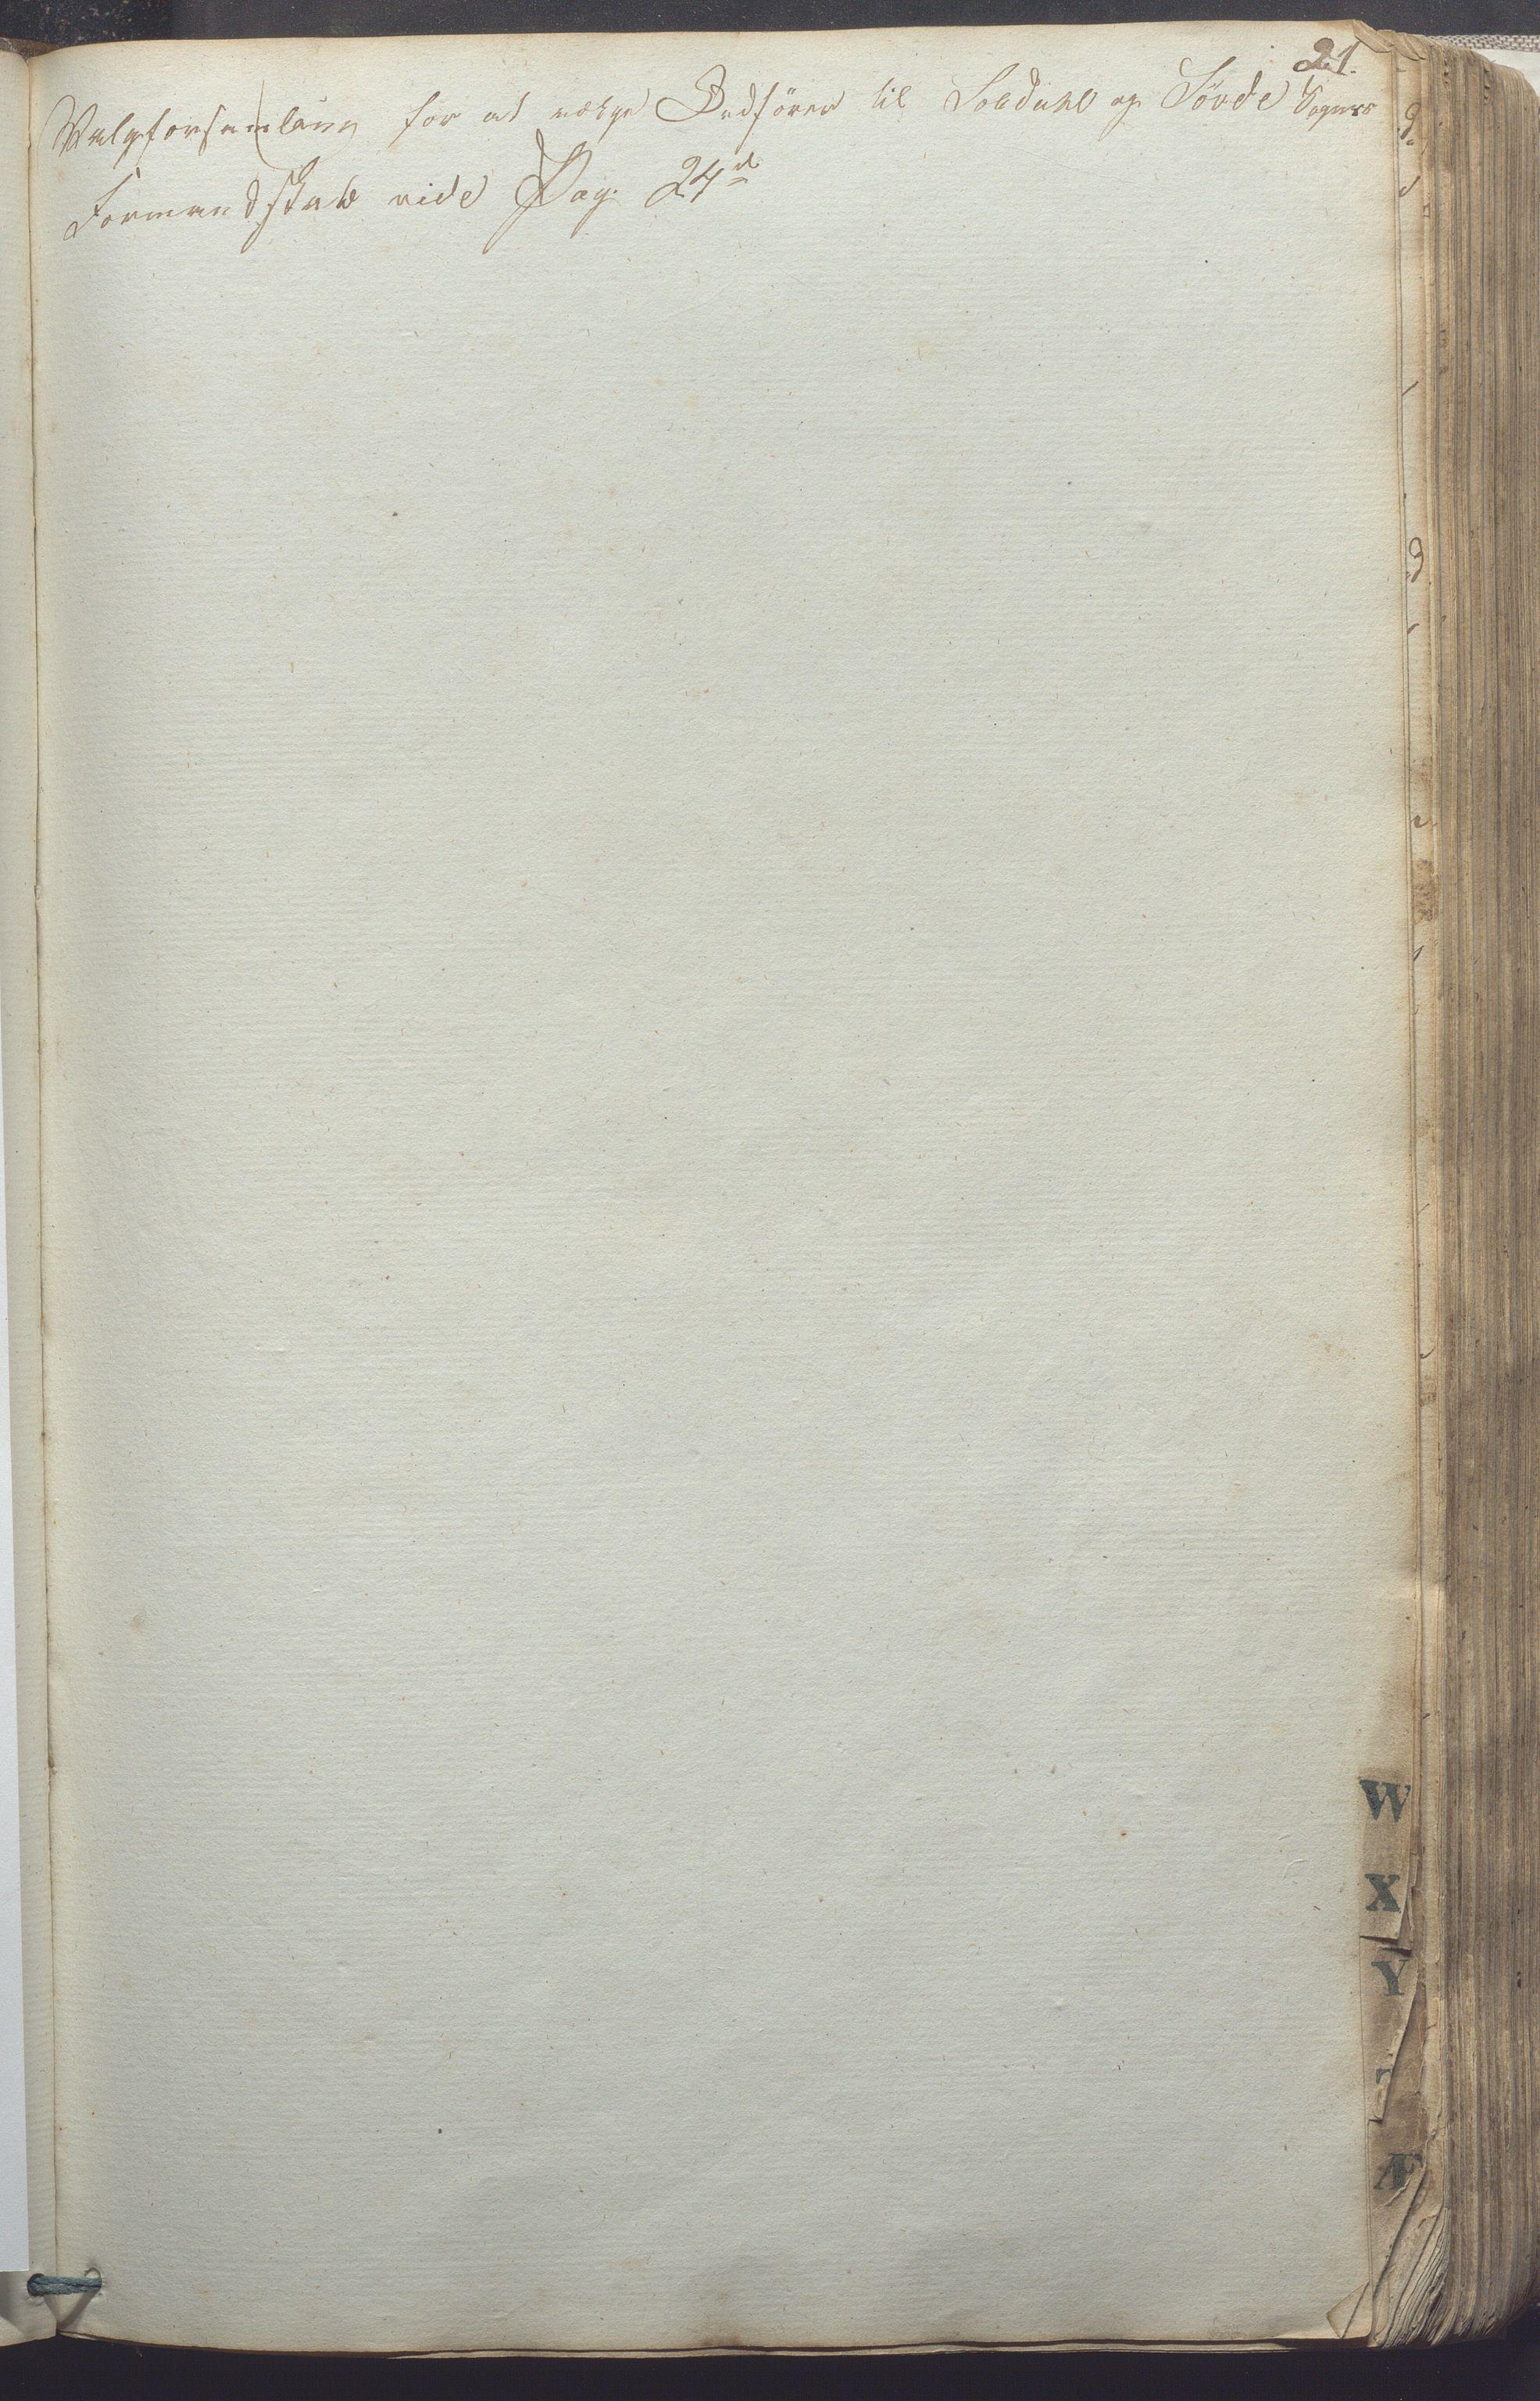 IKAR, Suldal kommune - Formannskapet/Rådmannen, A/Aa/L0001: Møtebok, 1837-1876, s. 21a